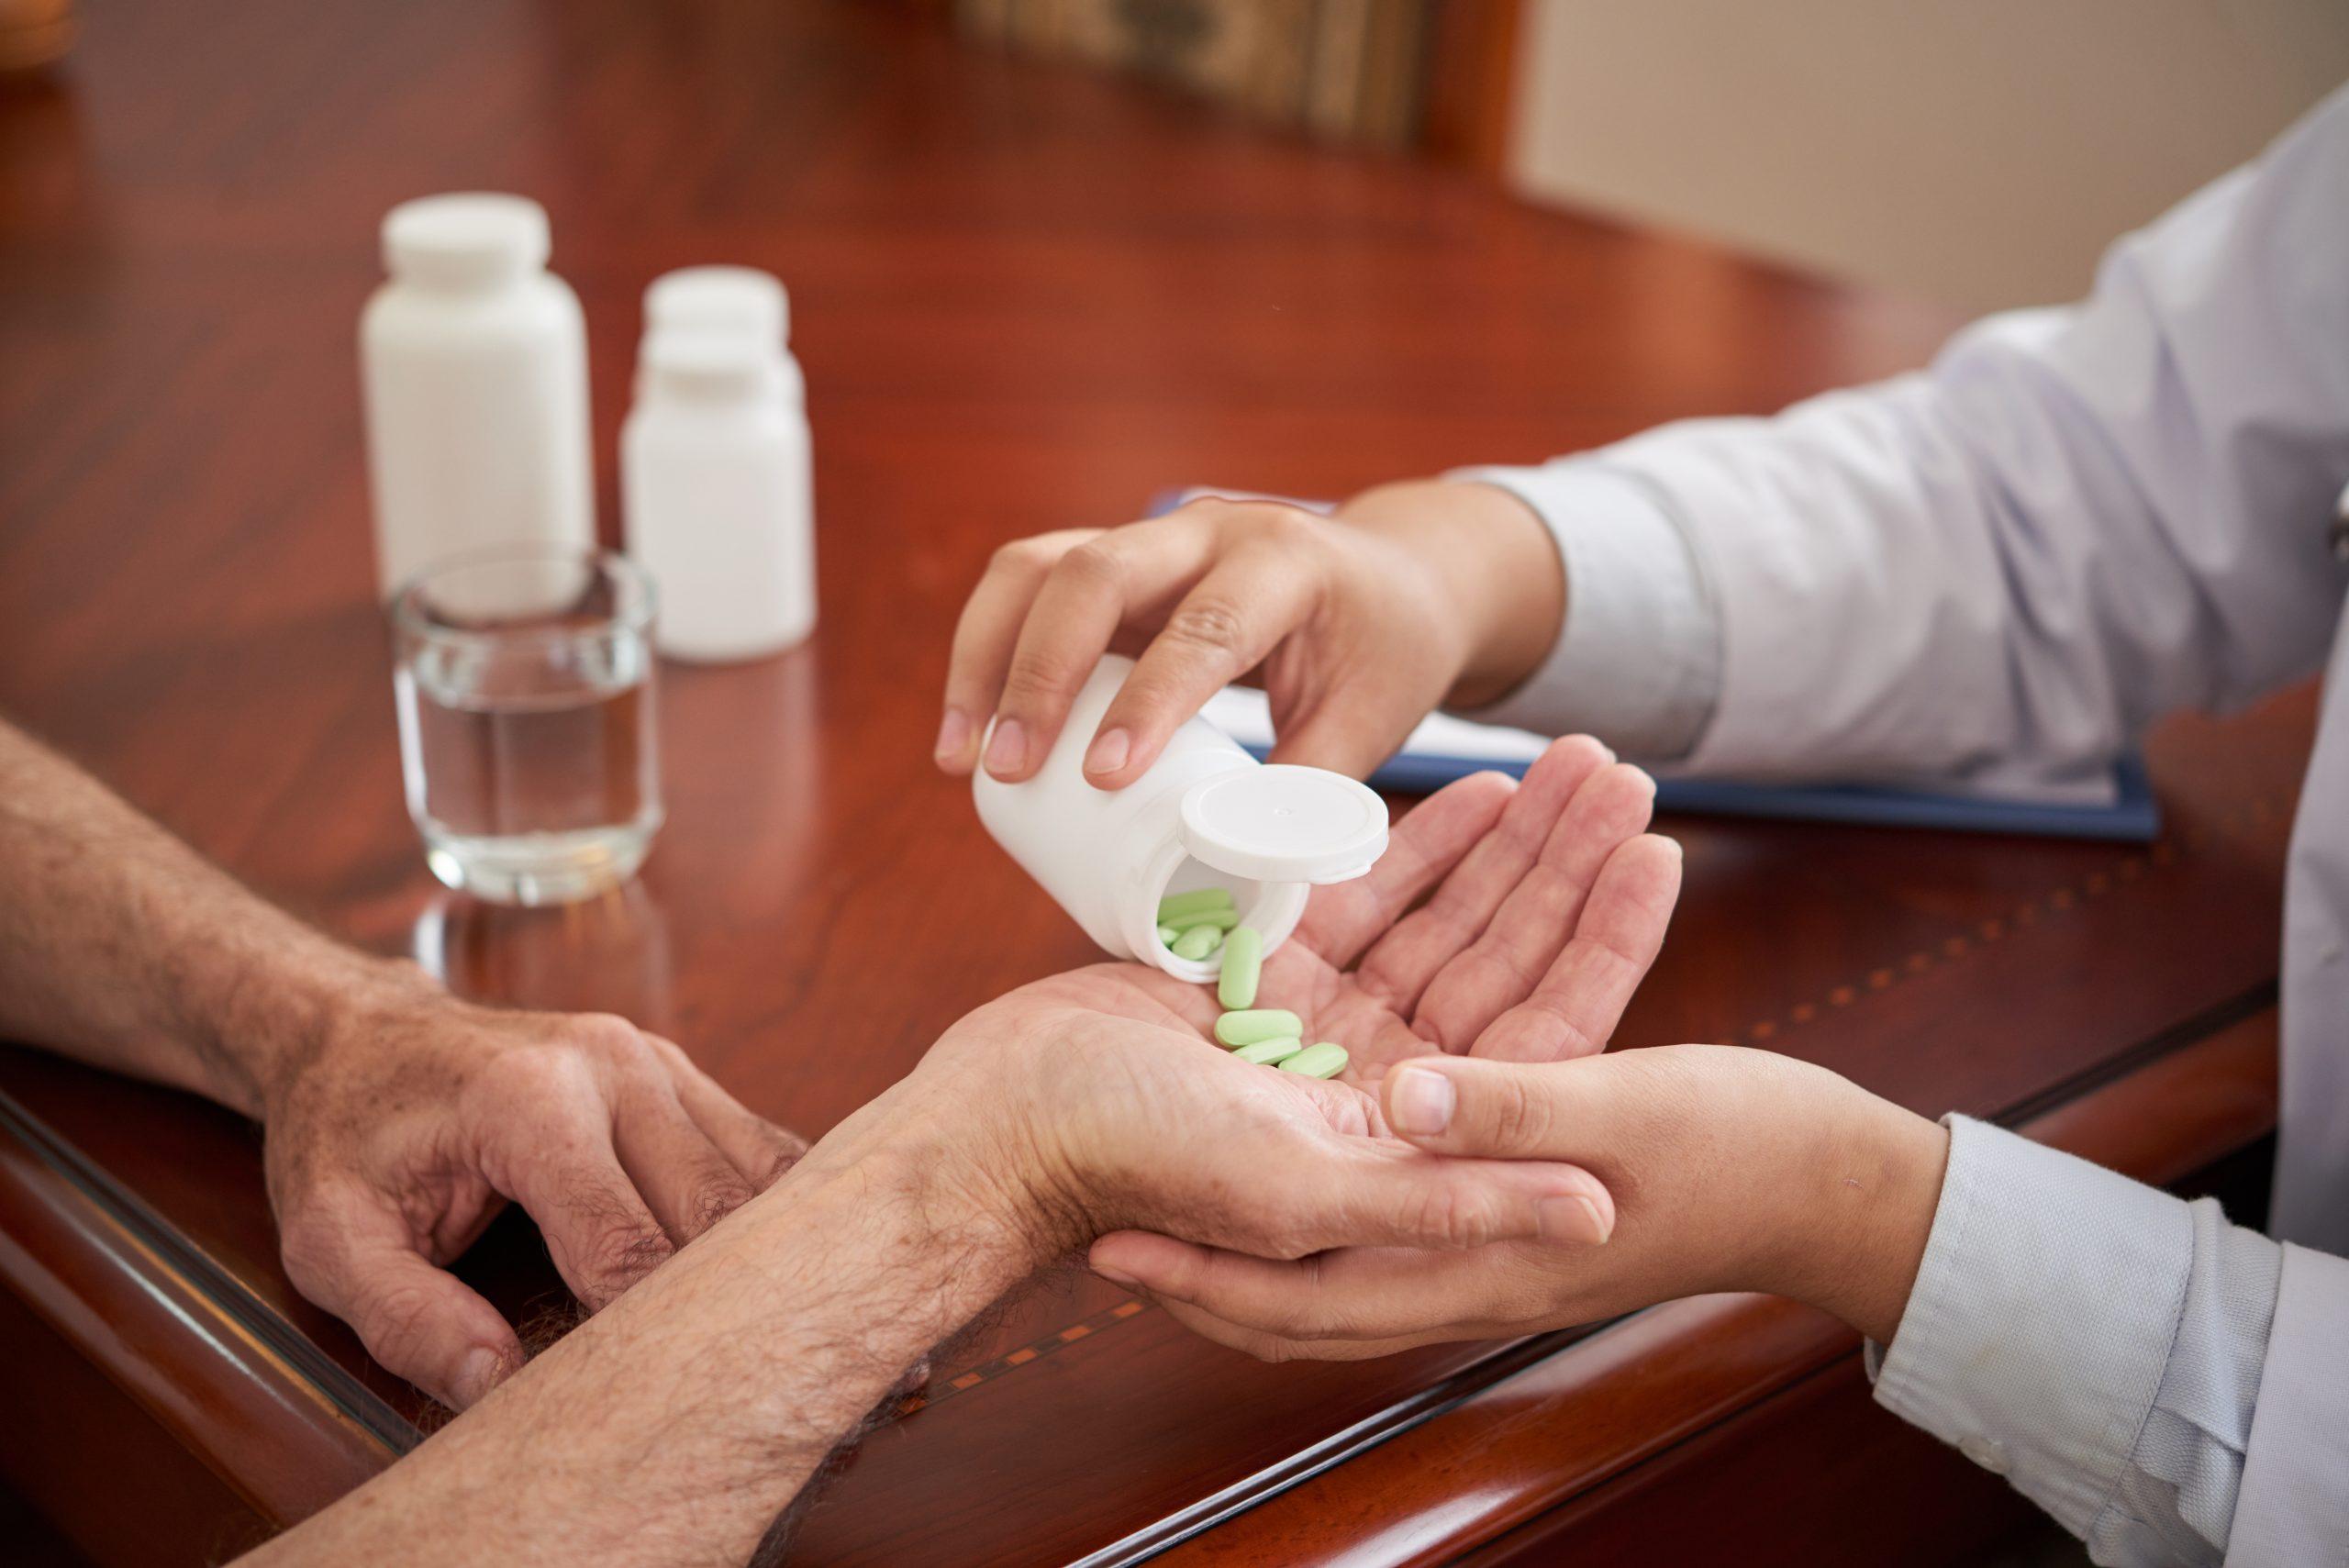 Giving Medicine